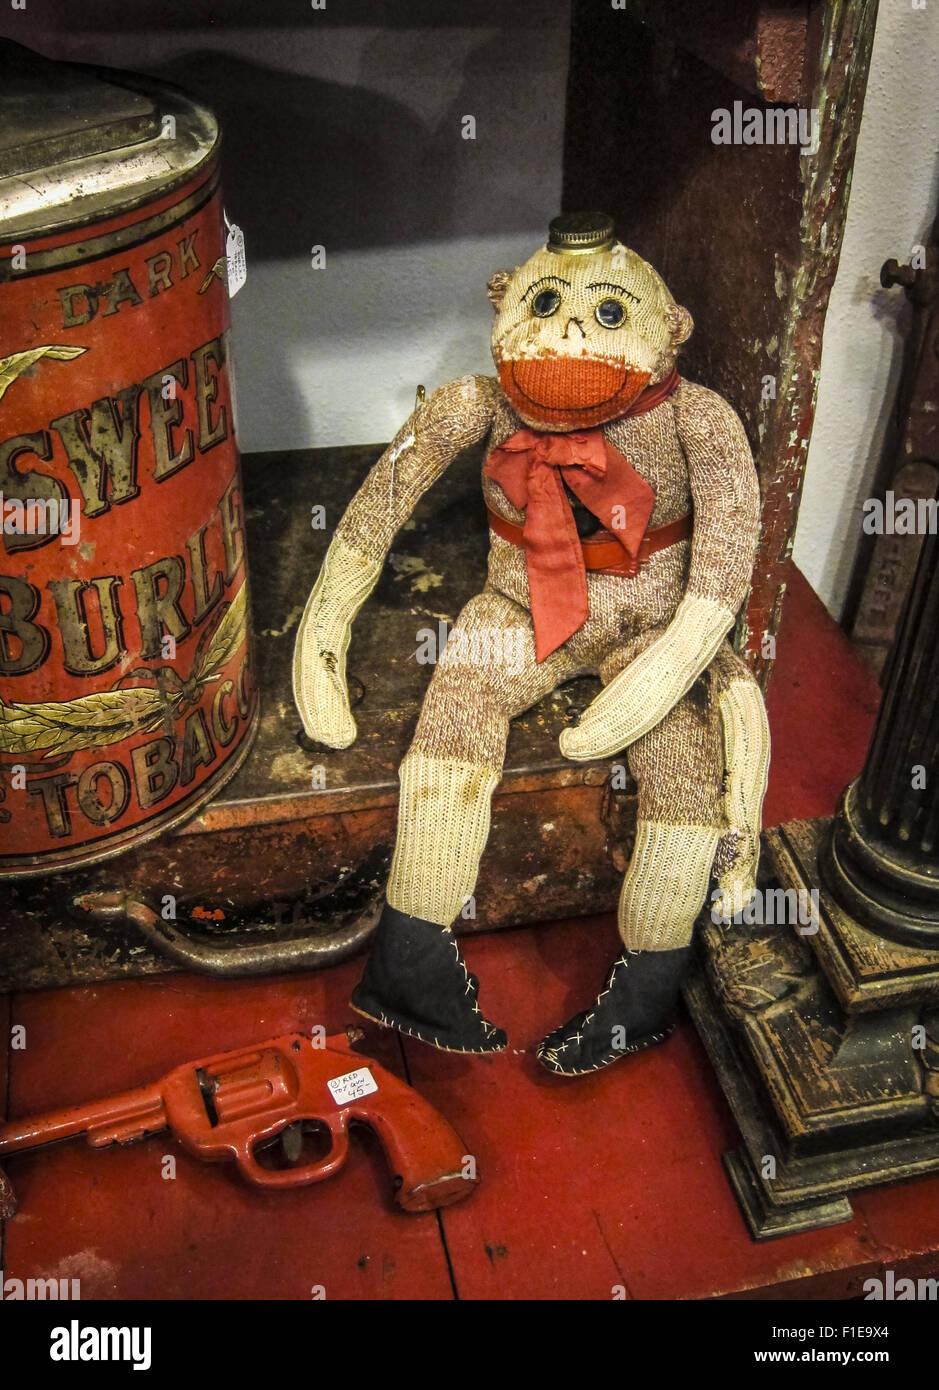 Vintage handicraft sock monkey in antique store - Stock Image